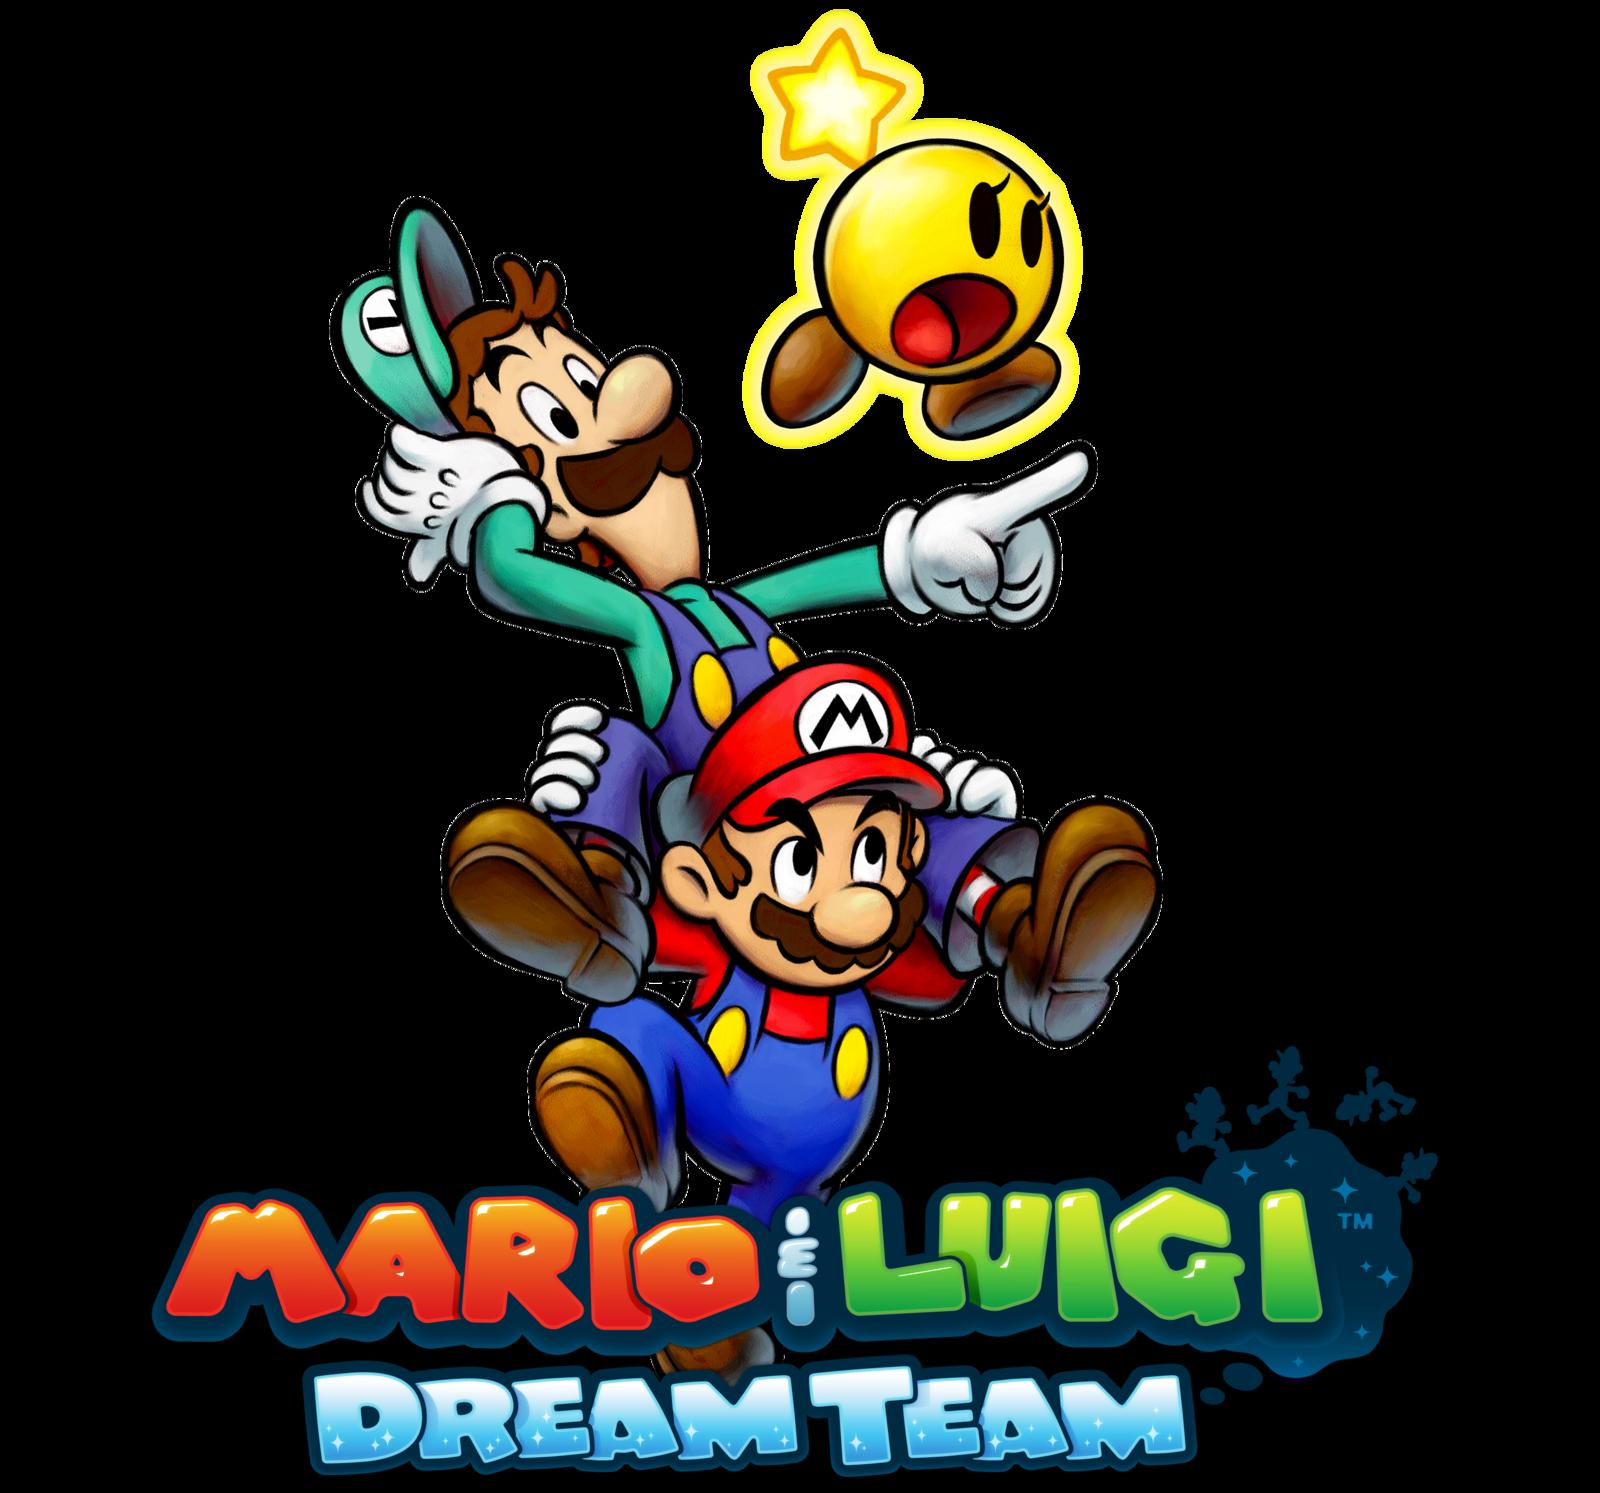 Mario And Luigi Dream Team By Legend Tony980 On Deviantart Super Mario Art Mario Art Mario And Luigi